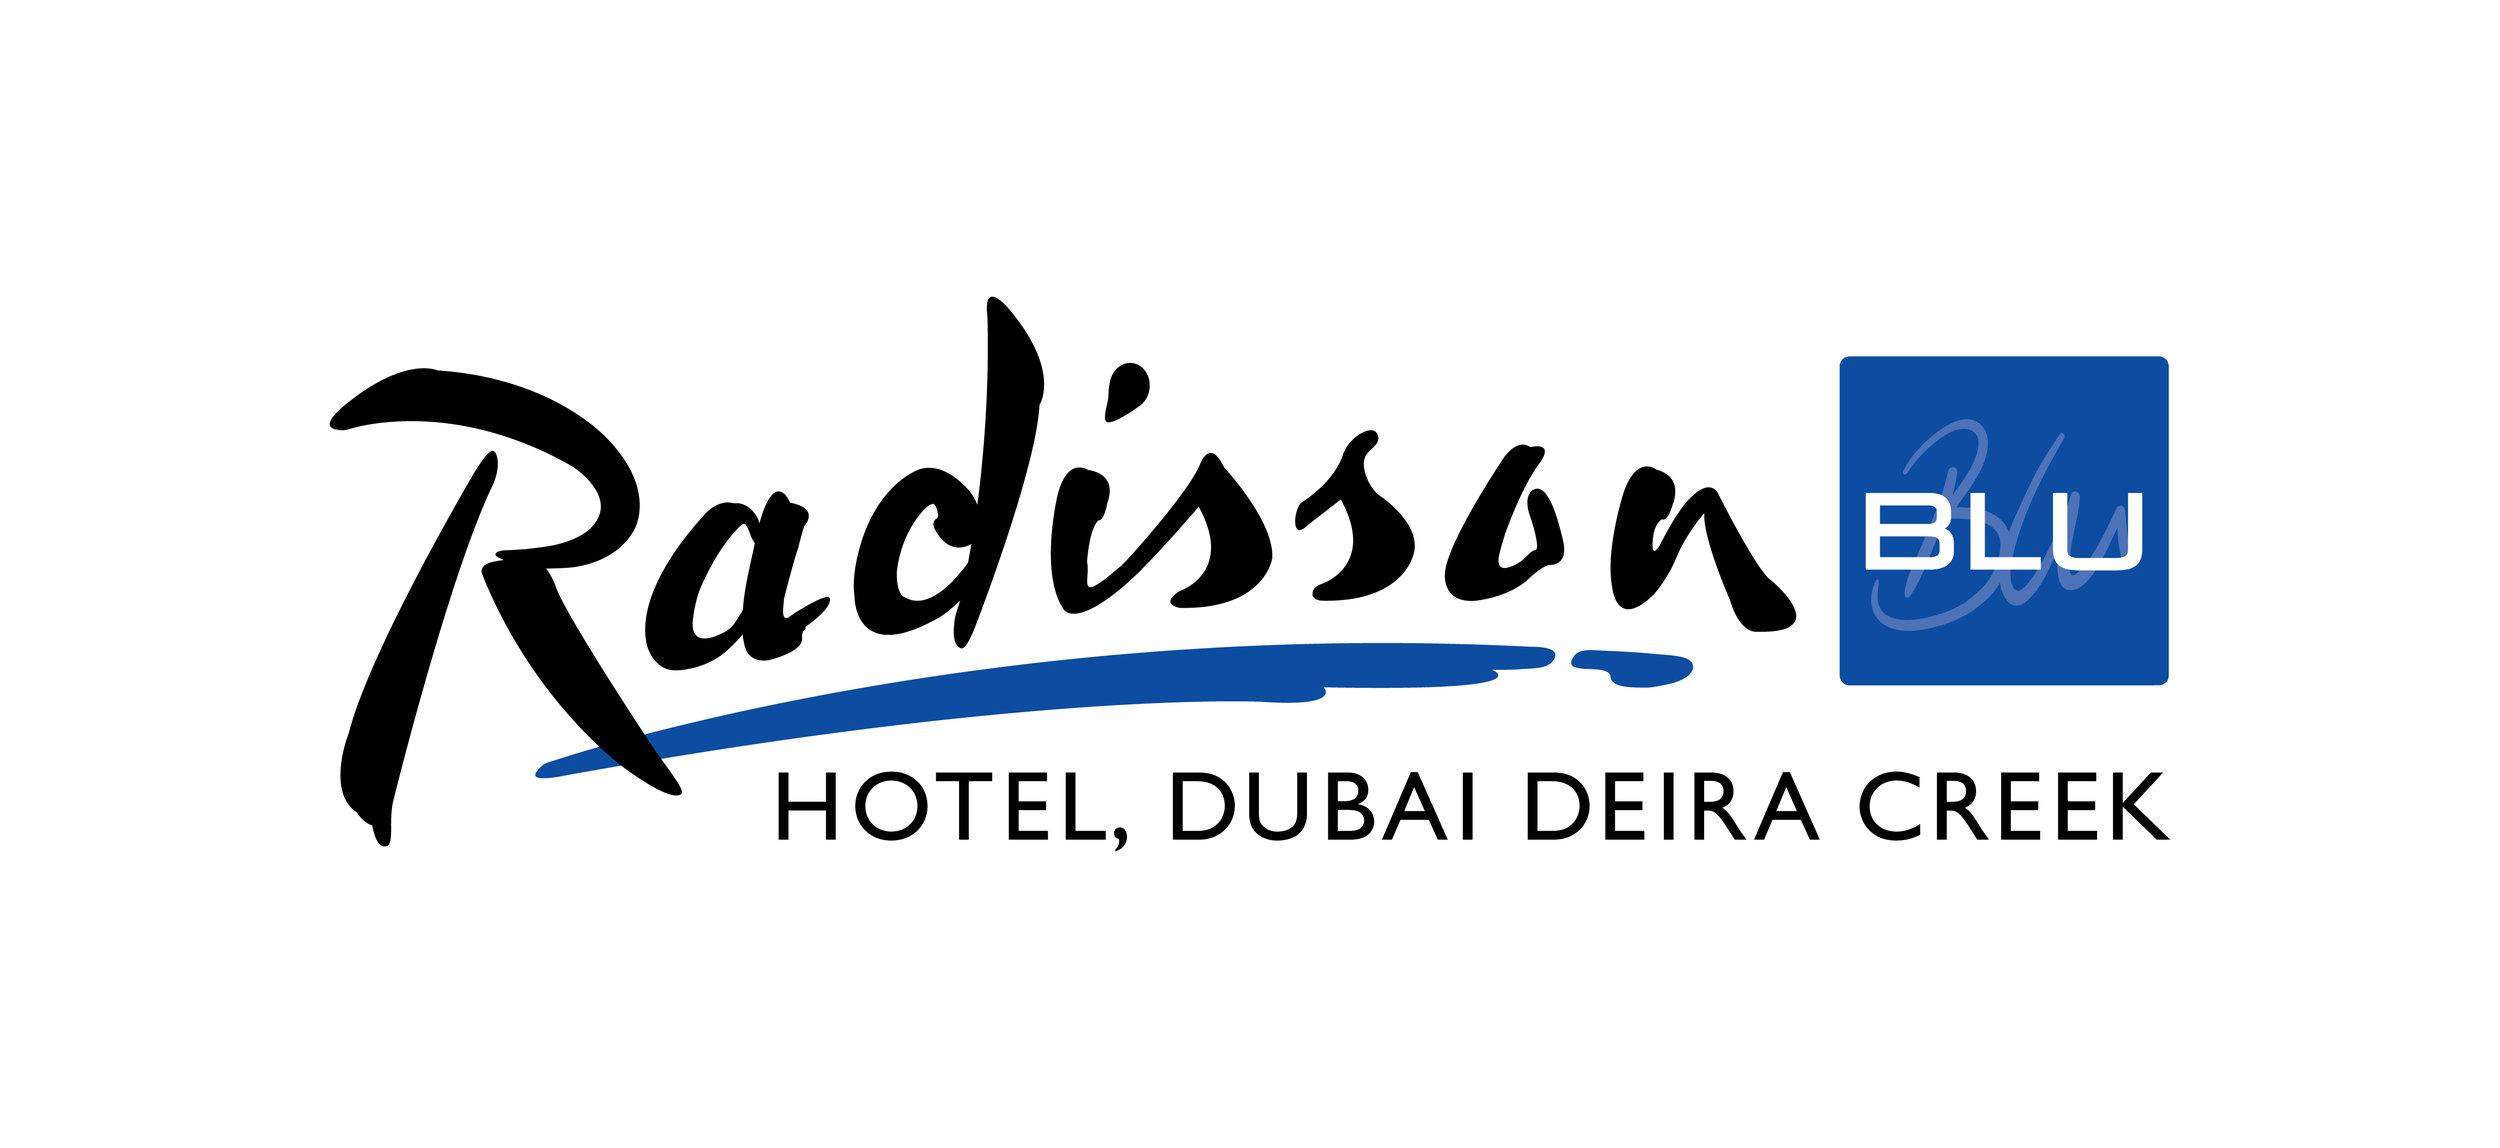 Radisson Blu Dubai Deira Creek.jpg